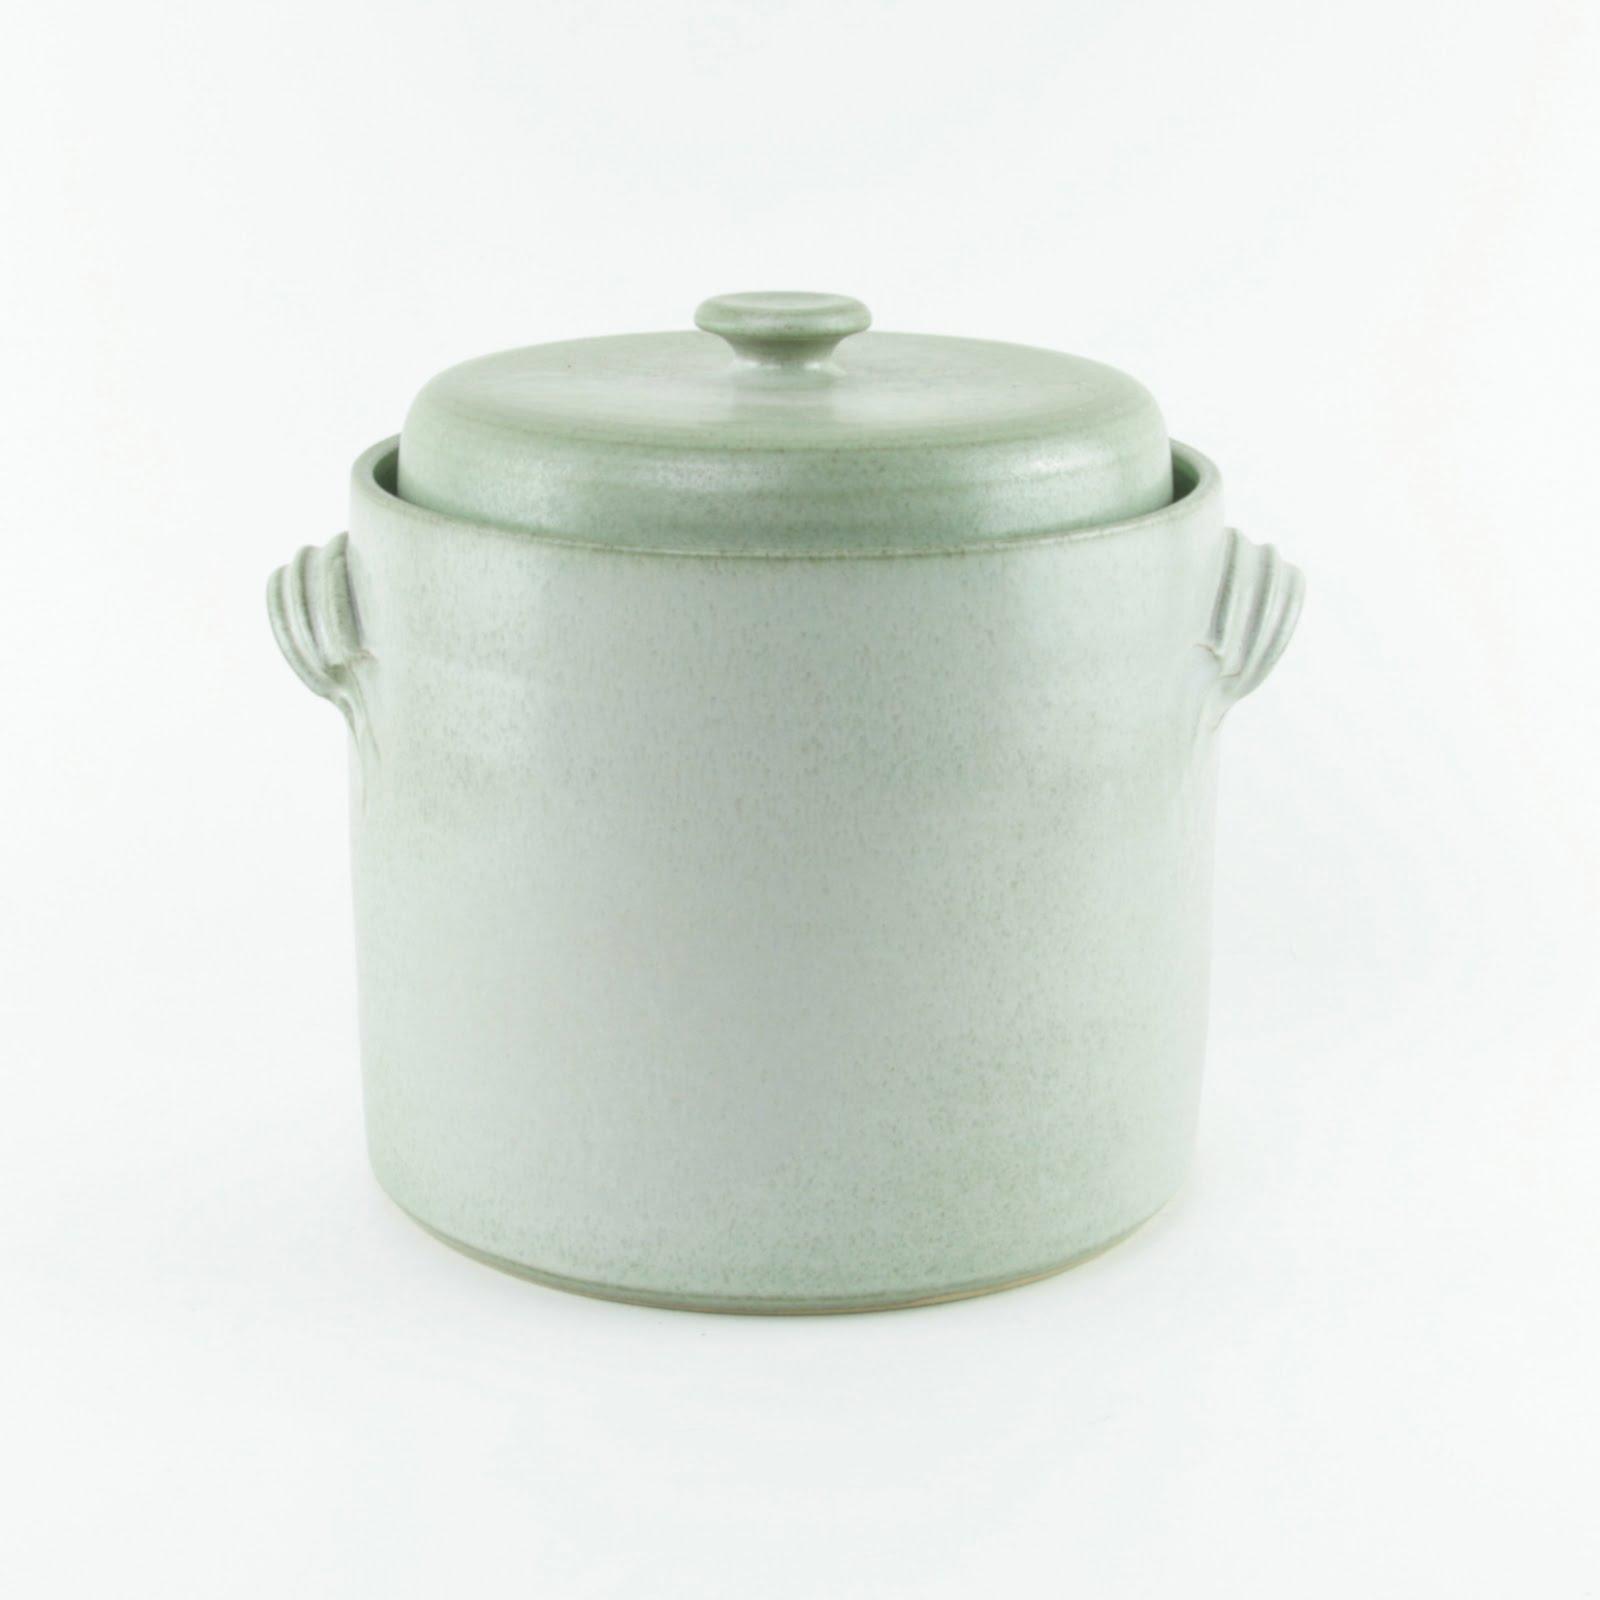 2 litre handmade ceramic sauerkraut crock in green with weight stones